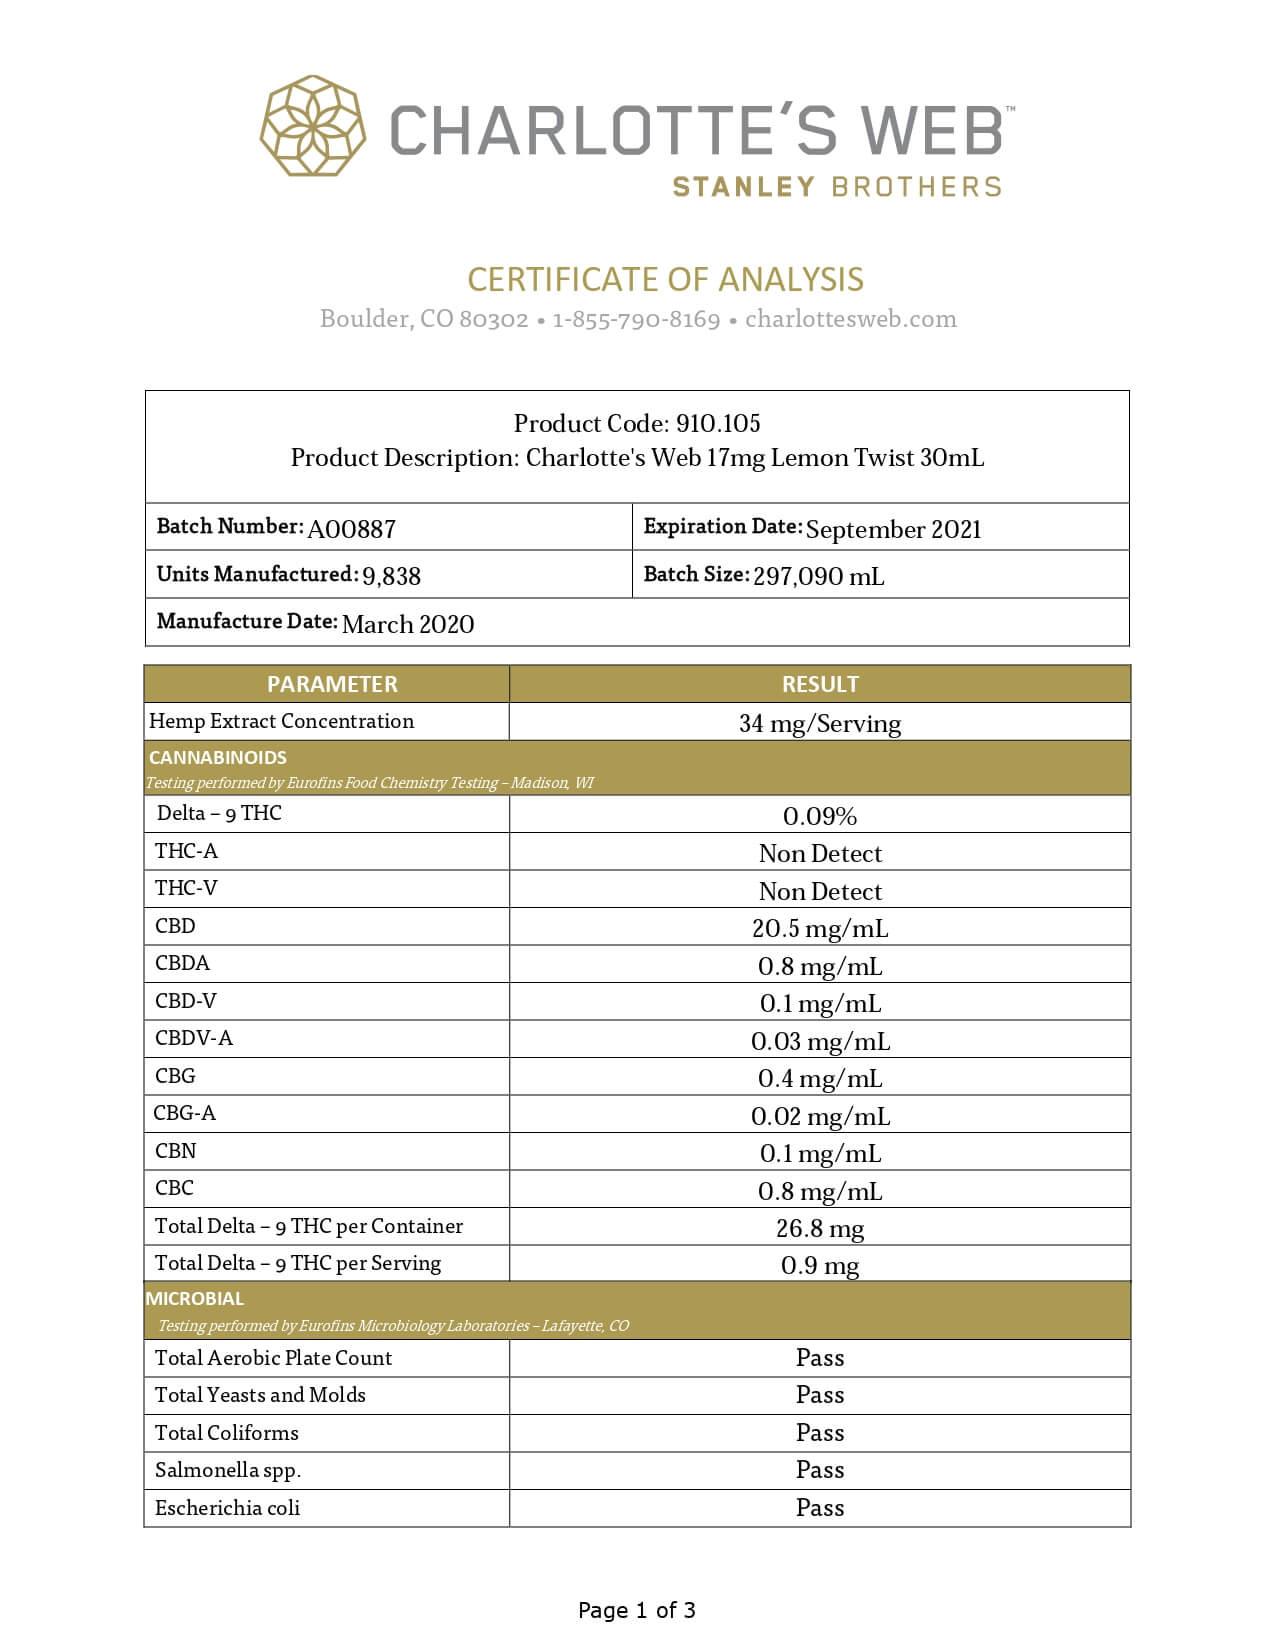 Charlottes Web CBD Tincture Full Spectrum Lemon Twist 17mg 1ml Lab Report